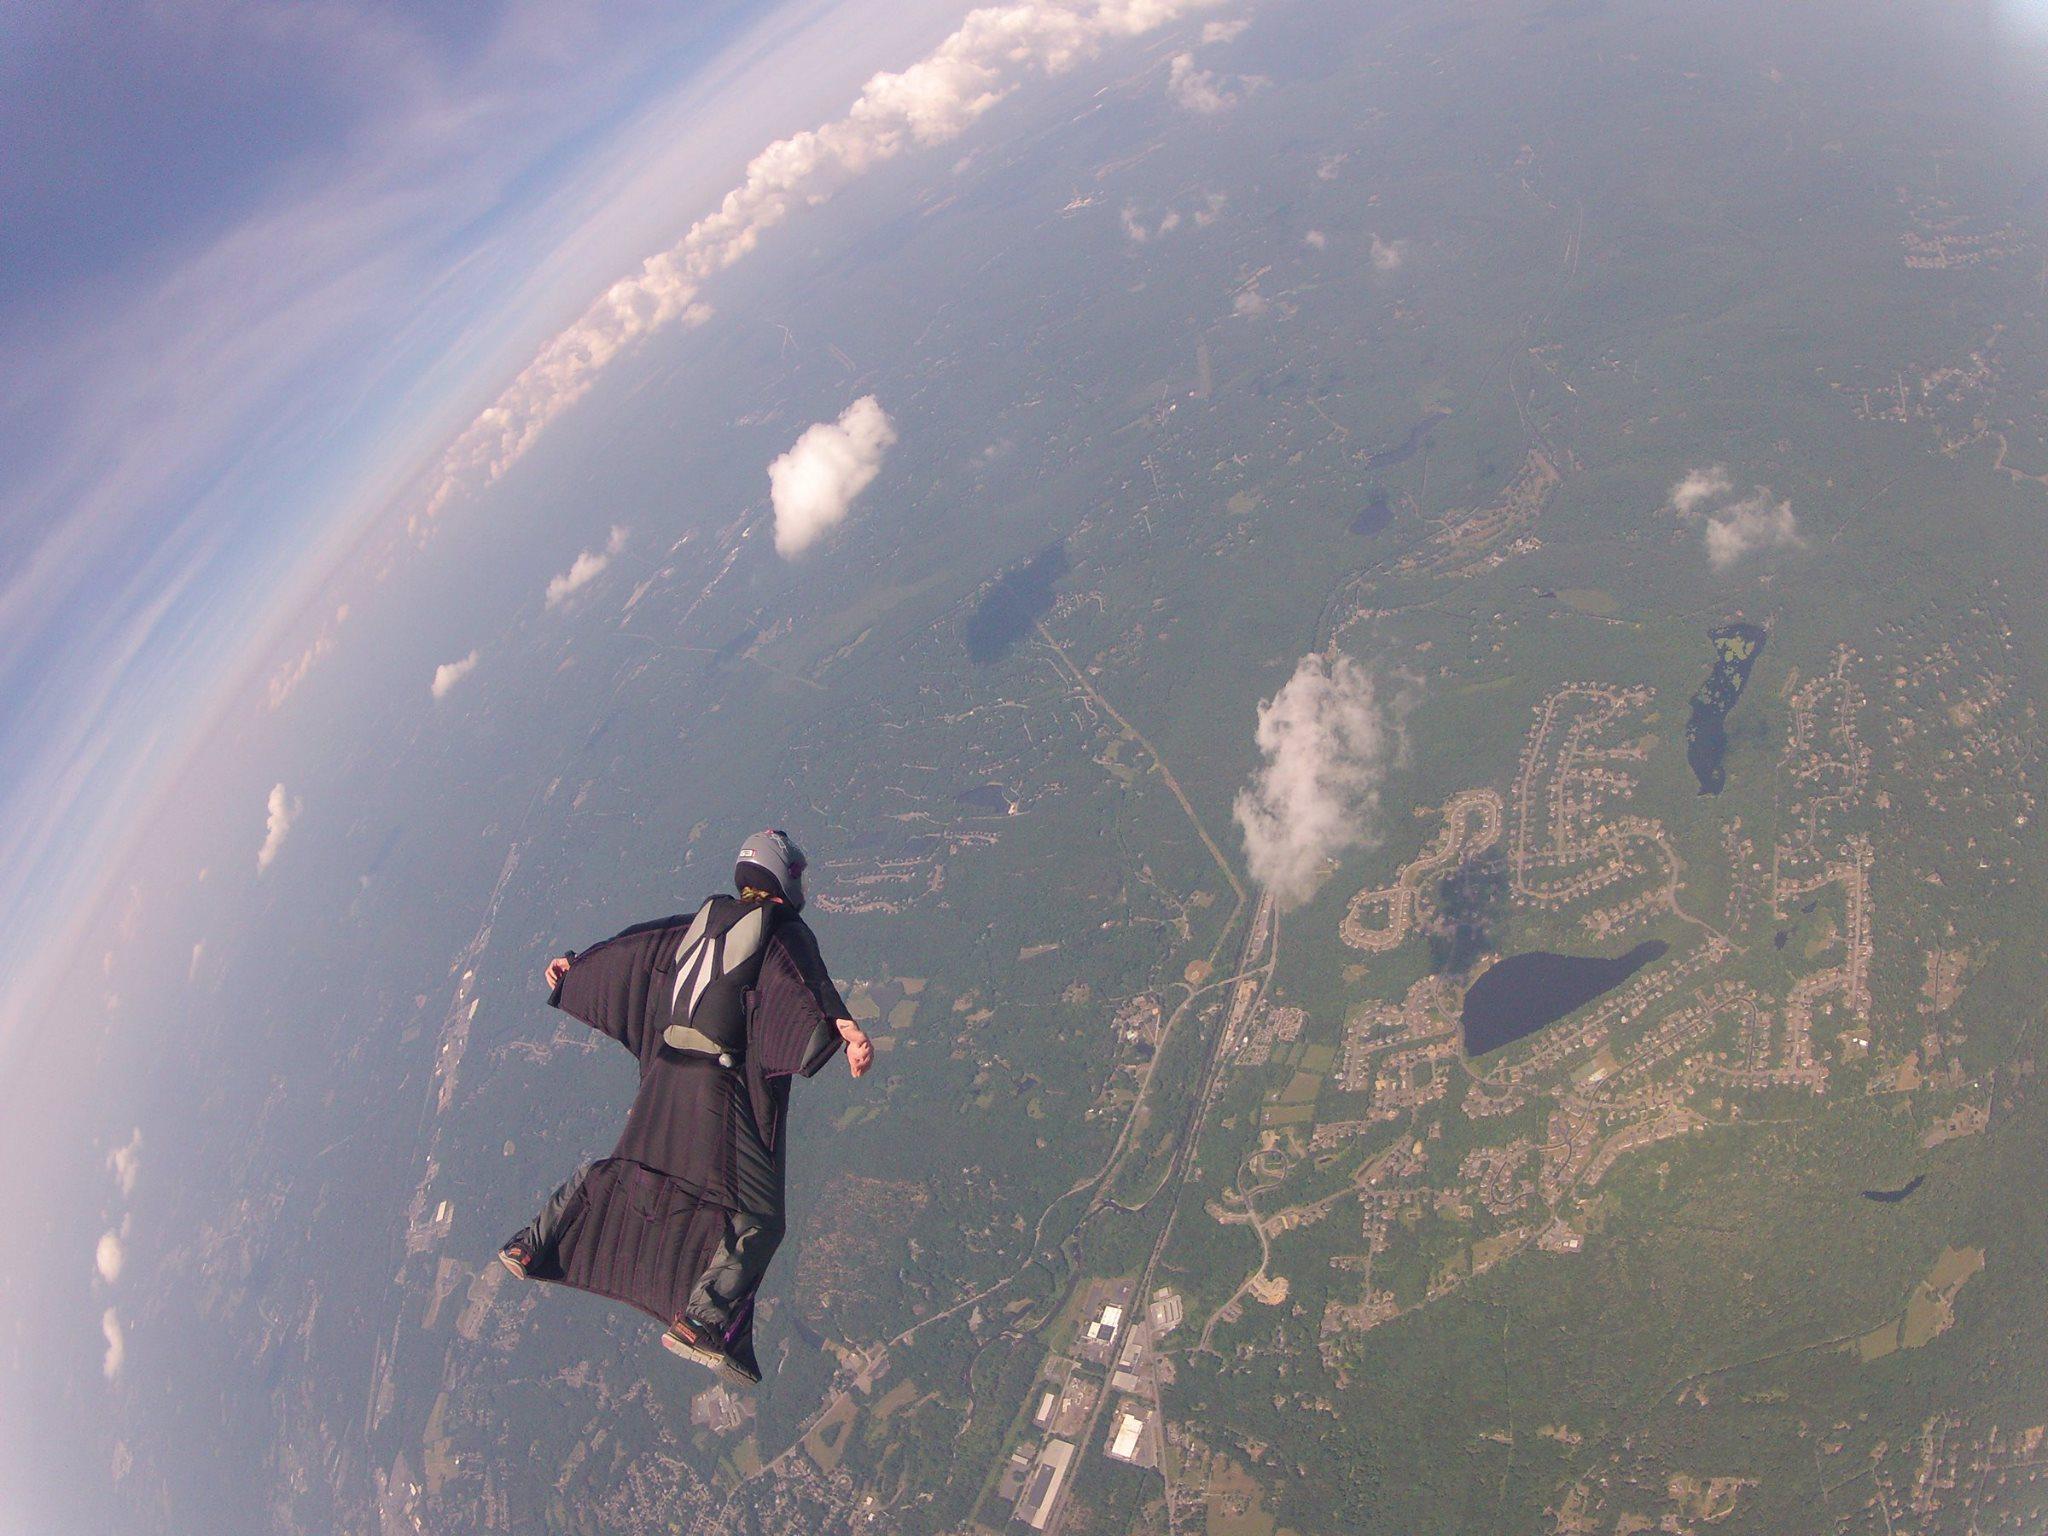 Flying my Swift2